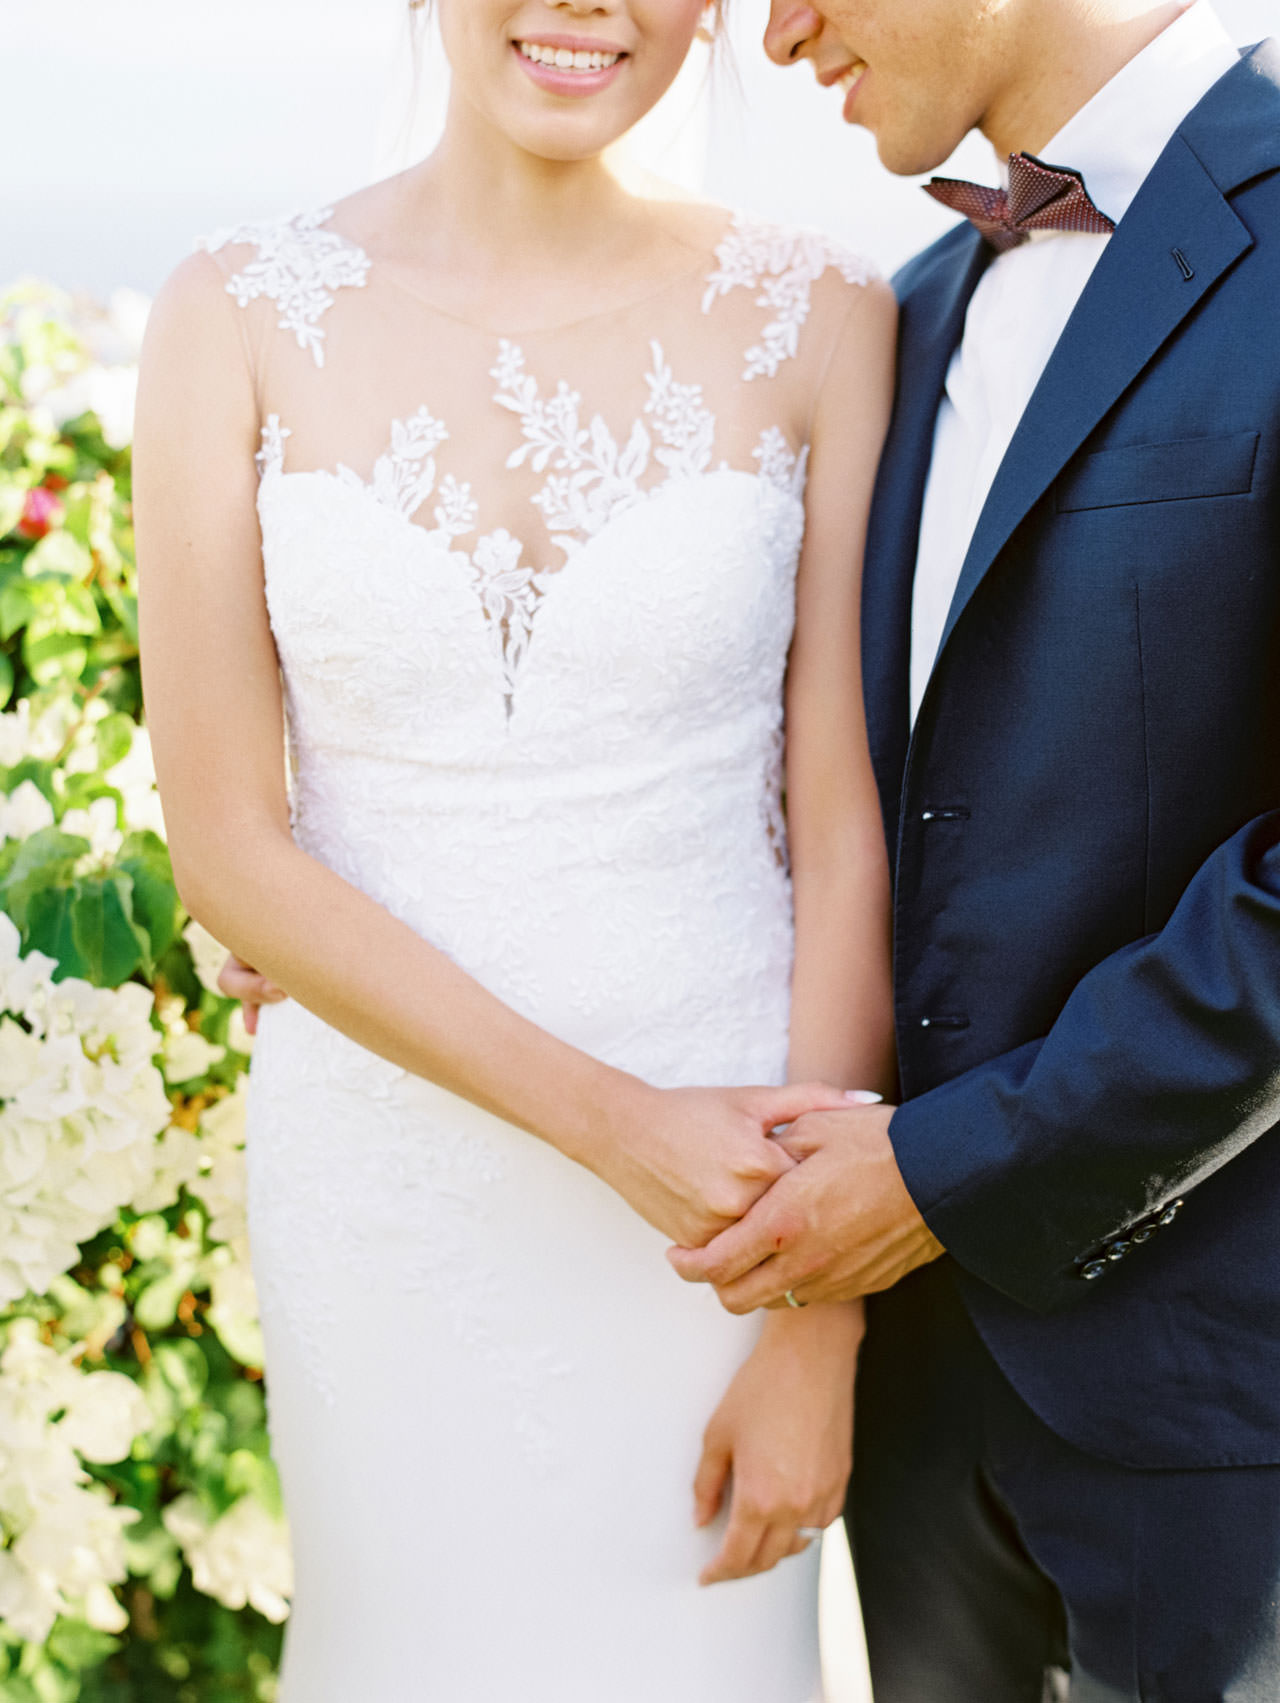 Uluwatu Cliff Wedding with Chinese Wedding Ceremony 30